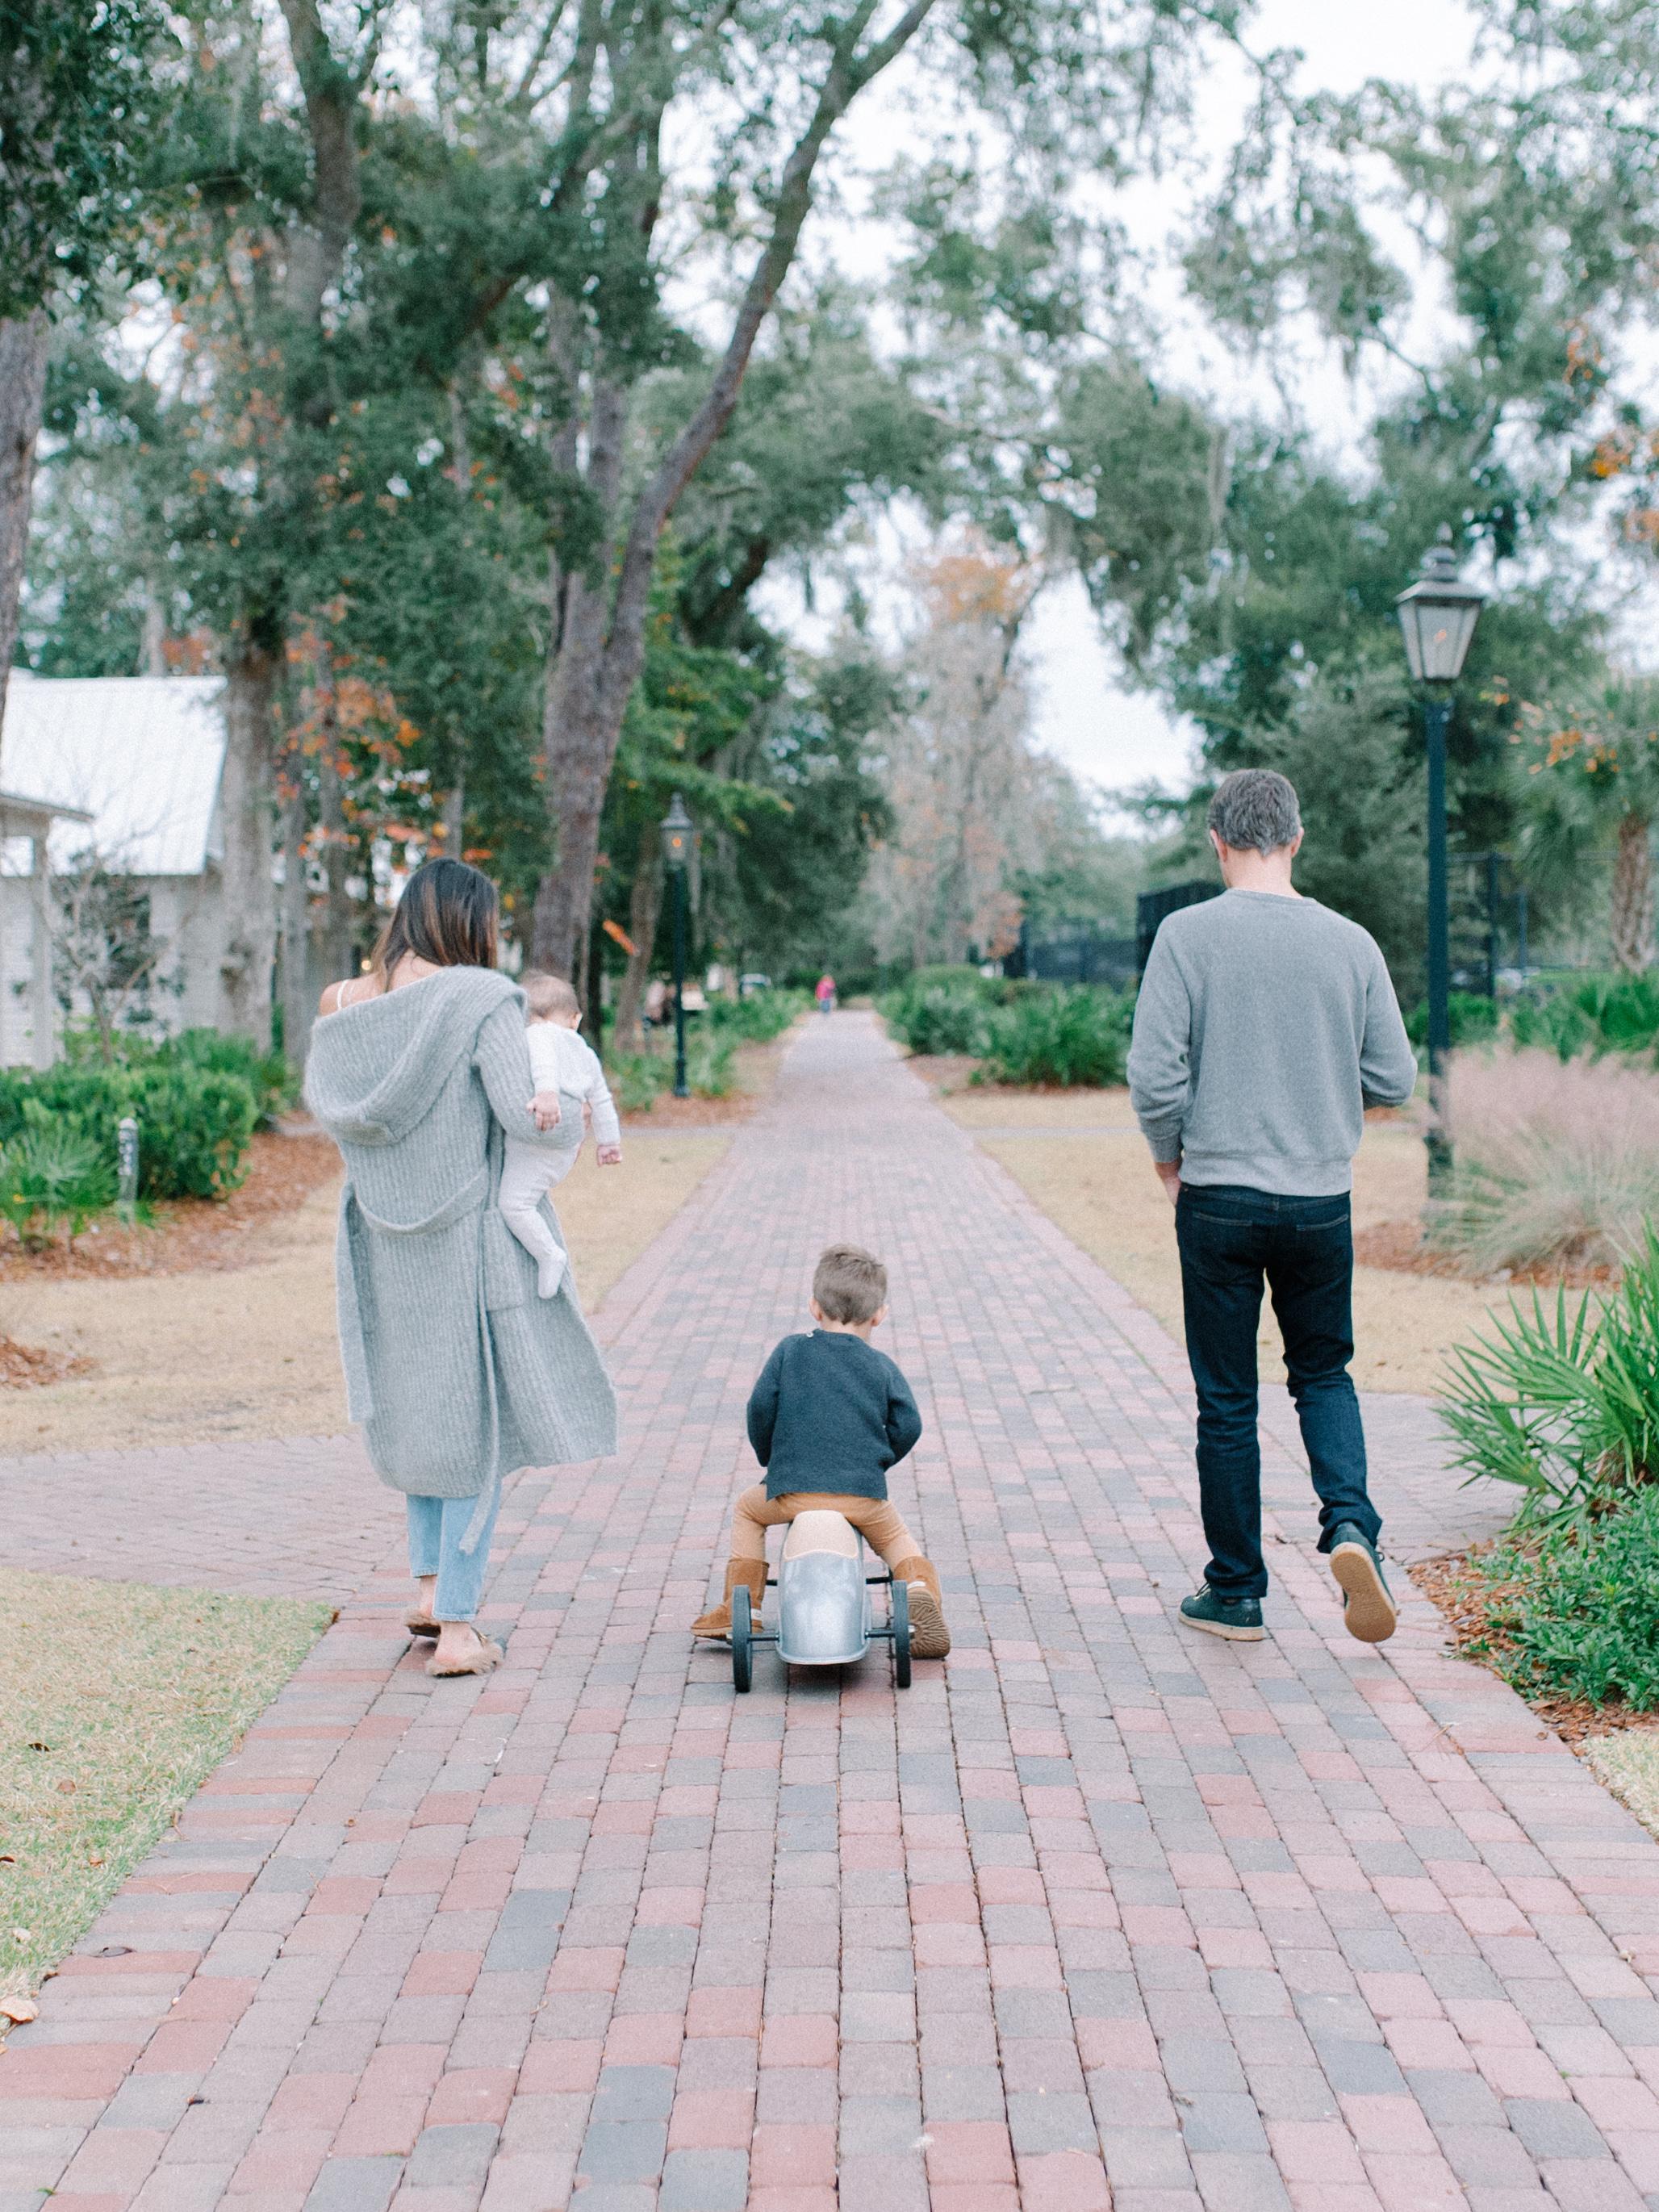 a.-Montage-palmetto-bluff-family-session-hannah-forsberg-atlanta-wedding-photographer113.JPG